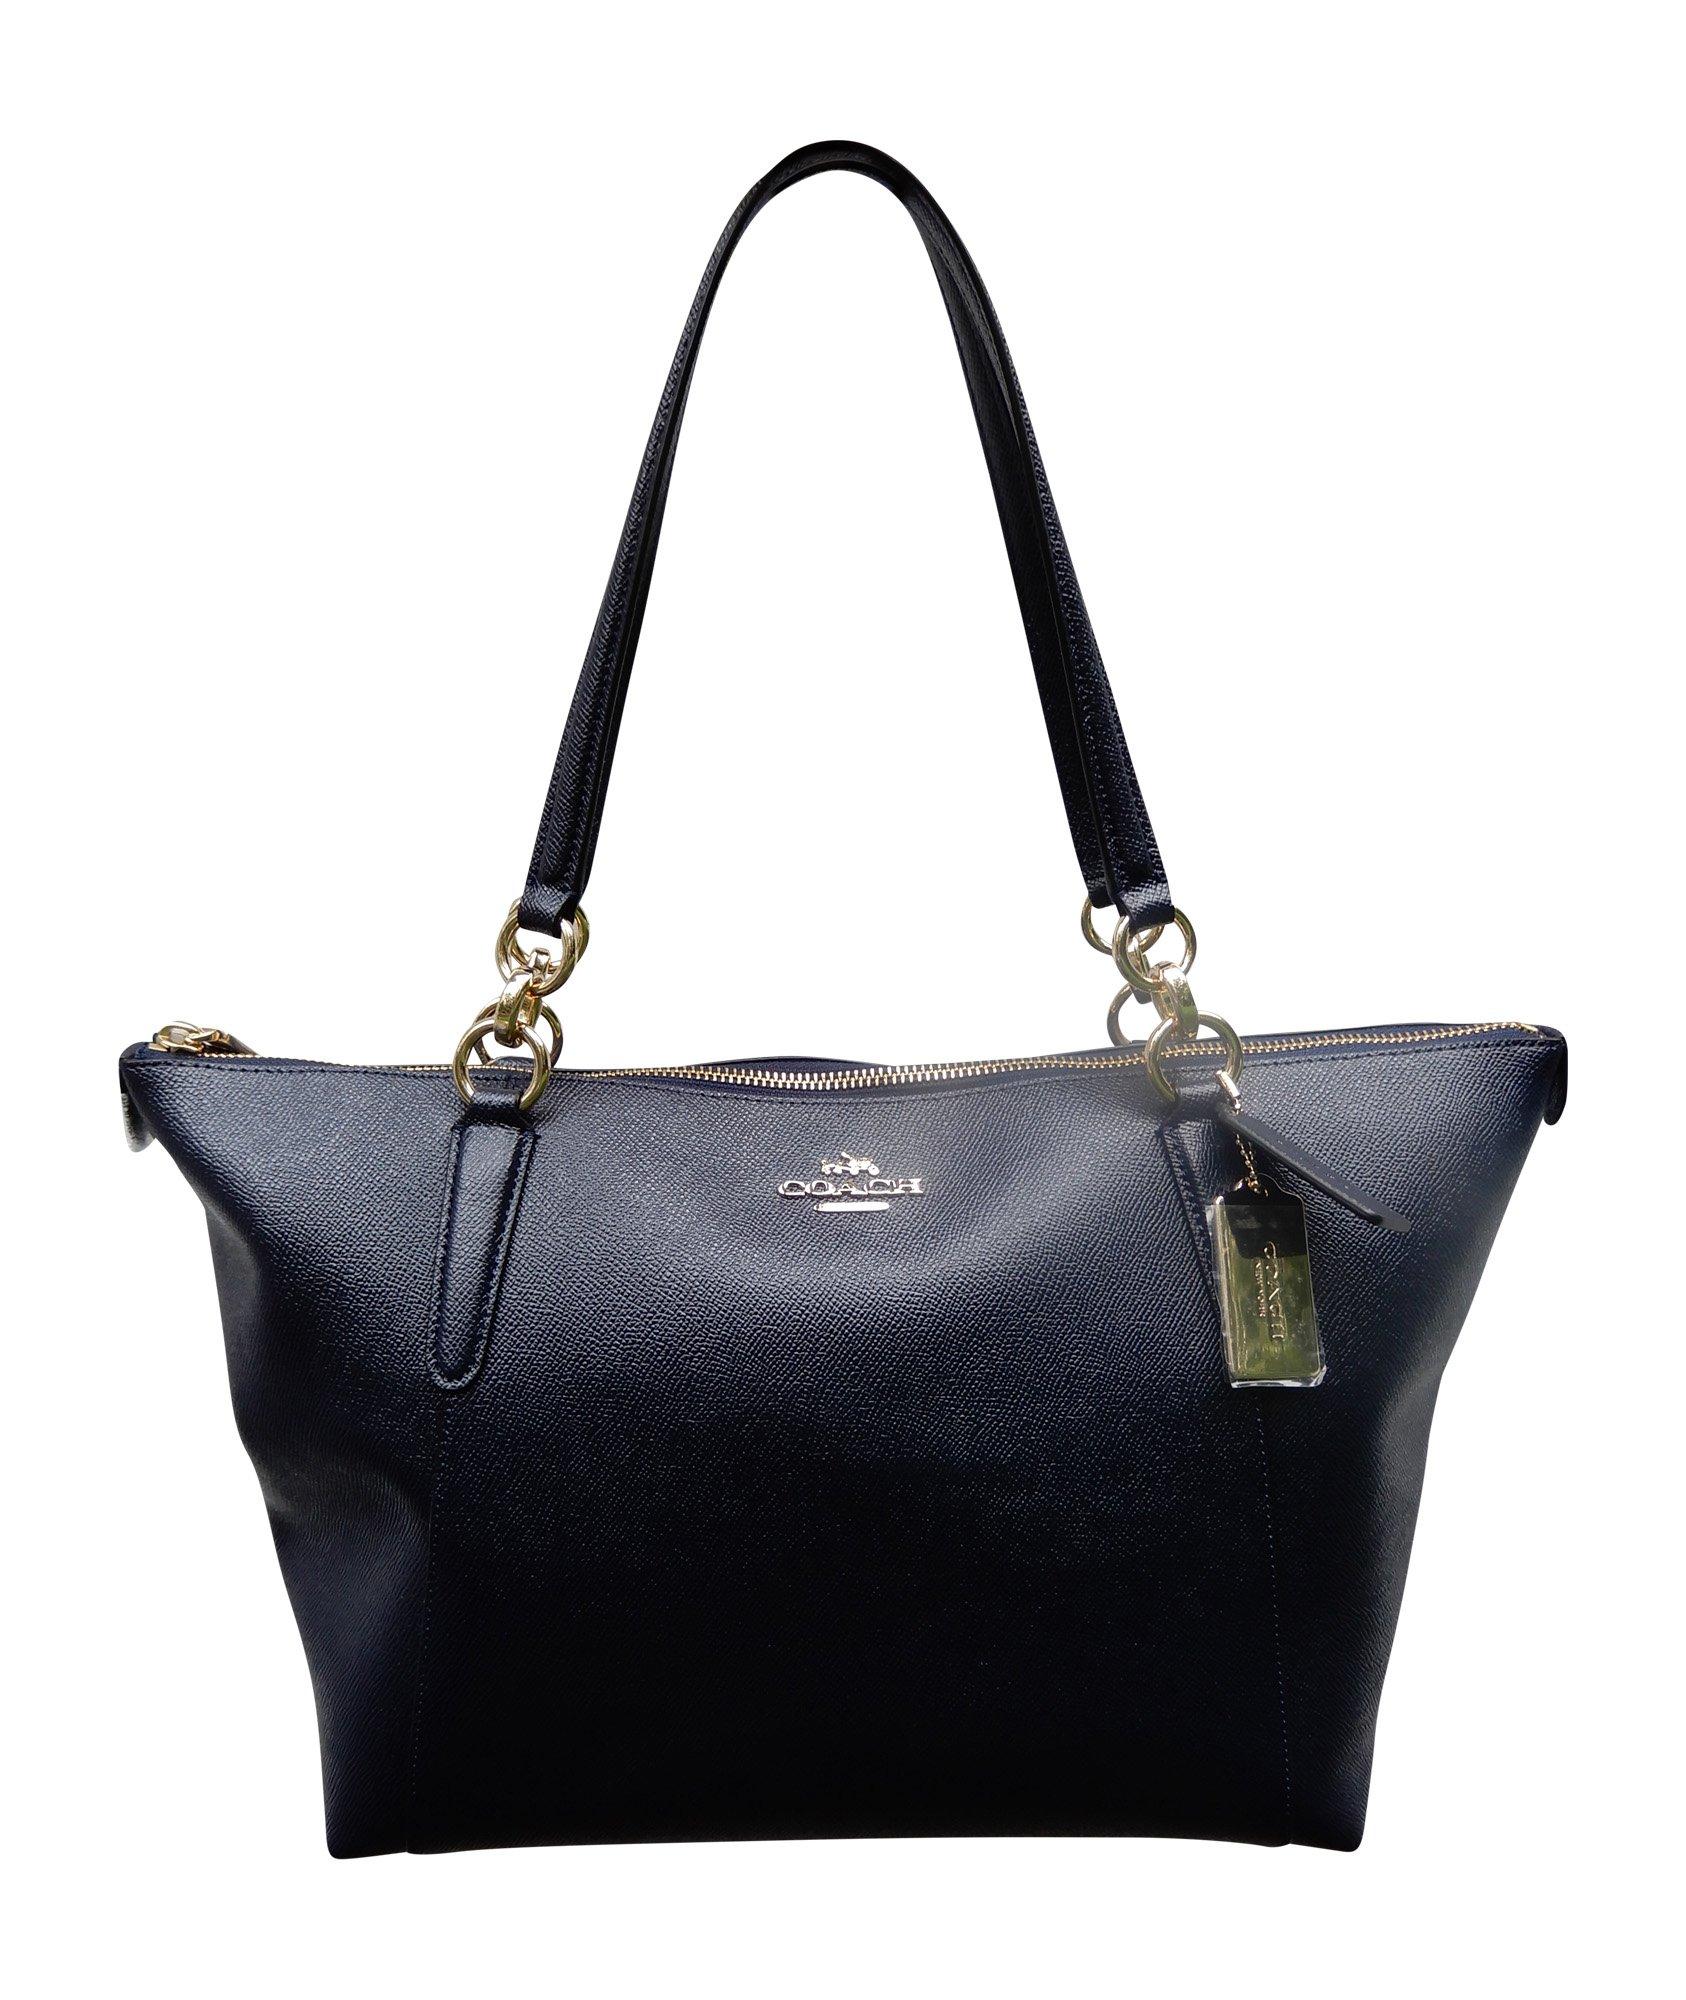 Coach Crossgrain Leather AVA Tote Bag Handbag, Midnight